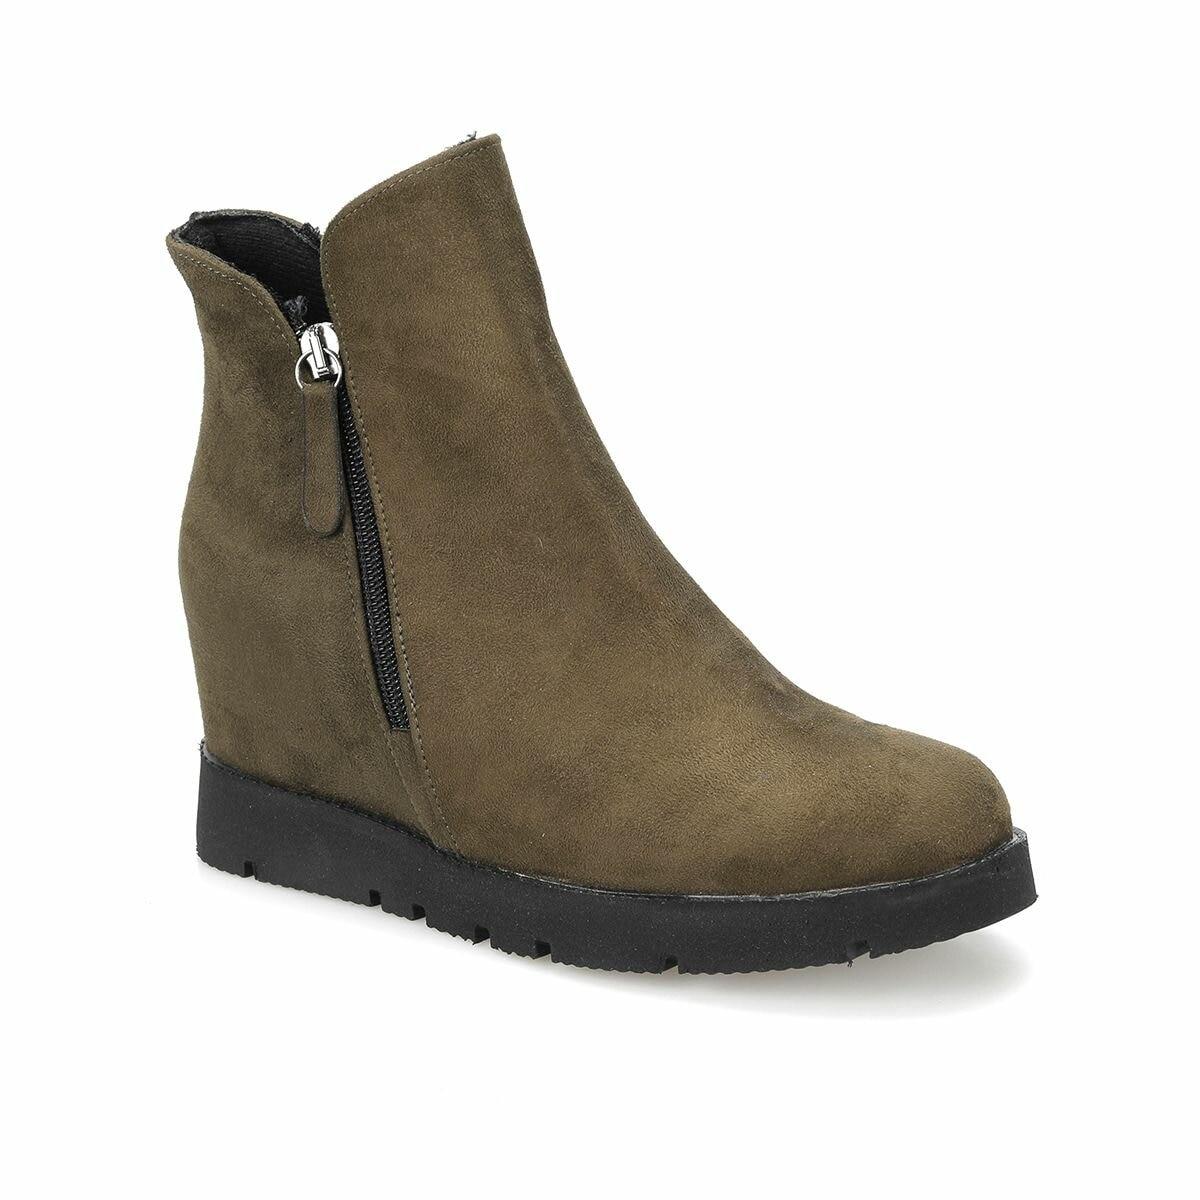 FLO FRED 56Z Khaki Women 'S Boots BUTIGO